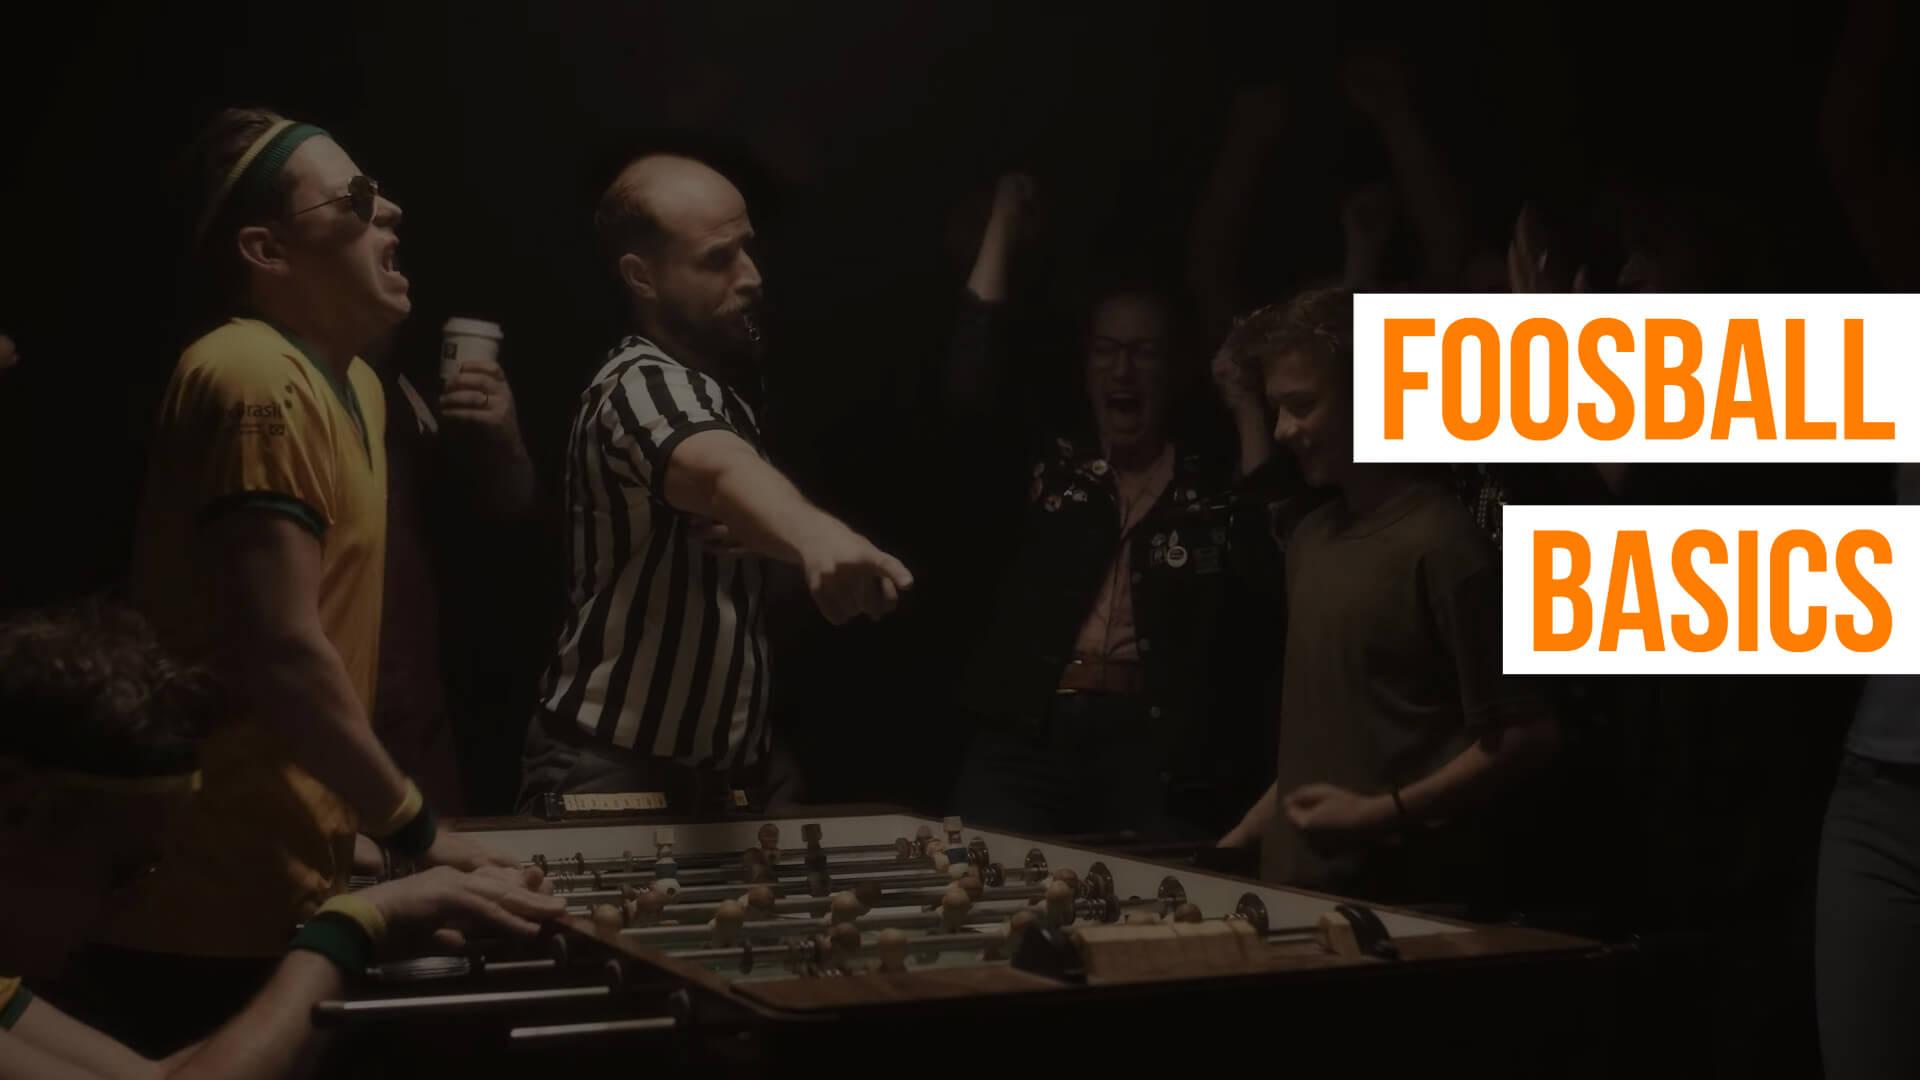 Foosball Basics